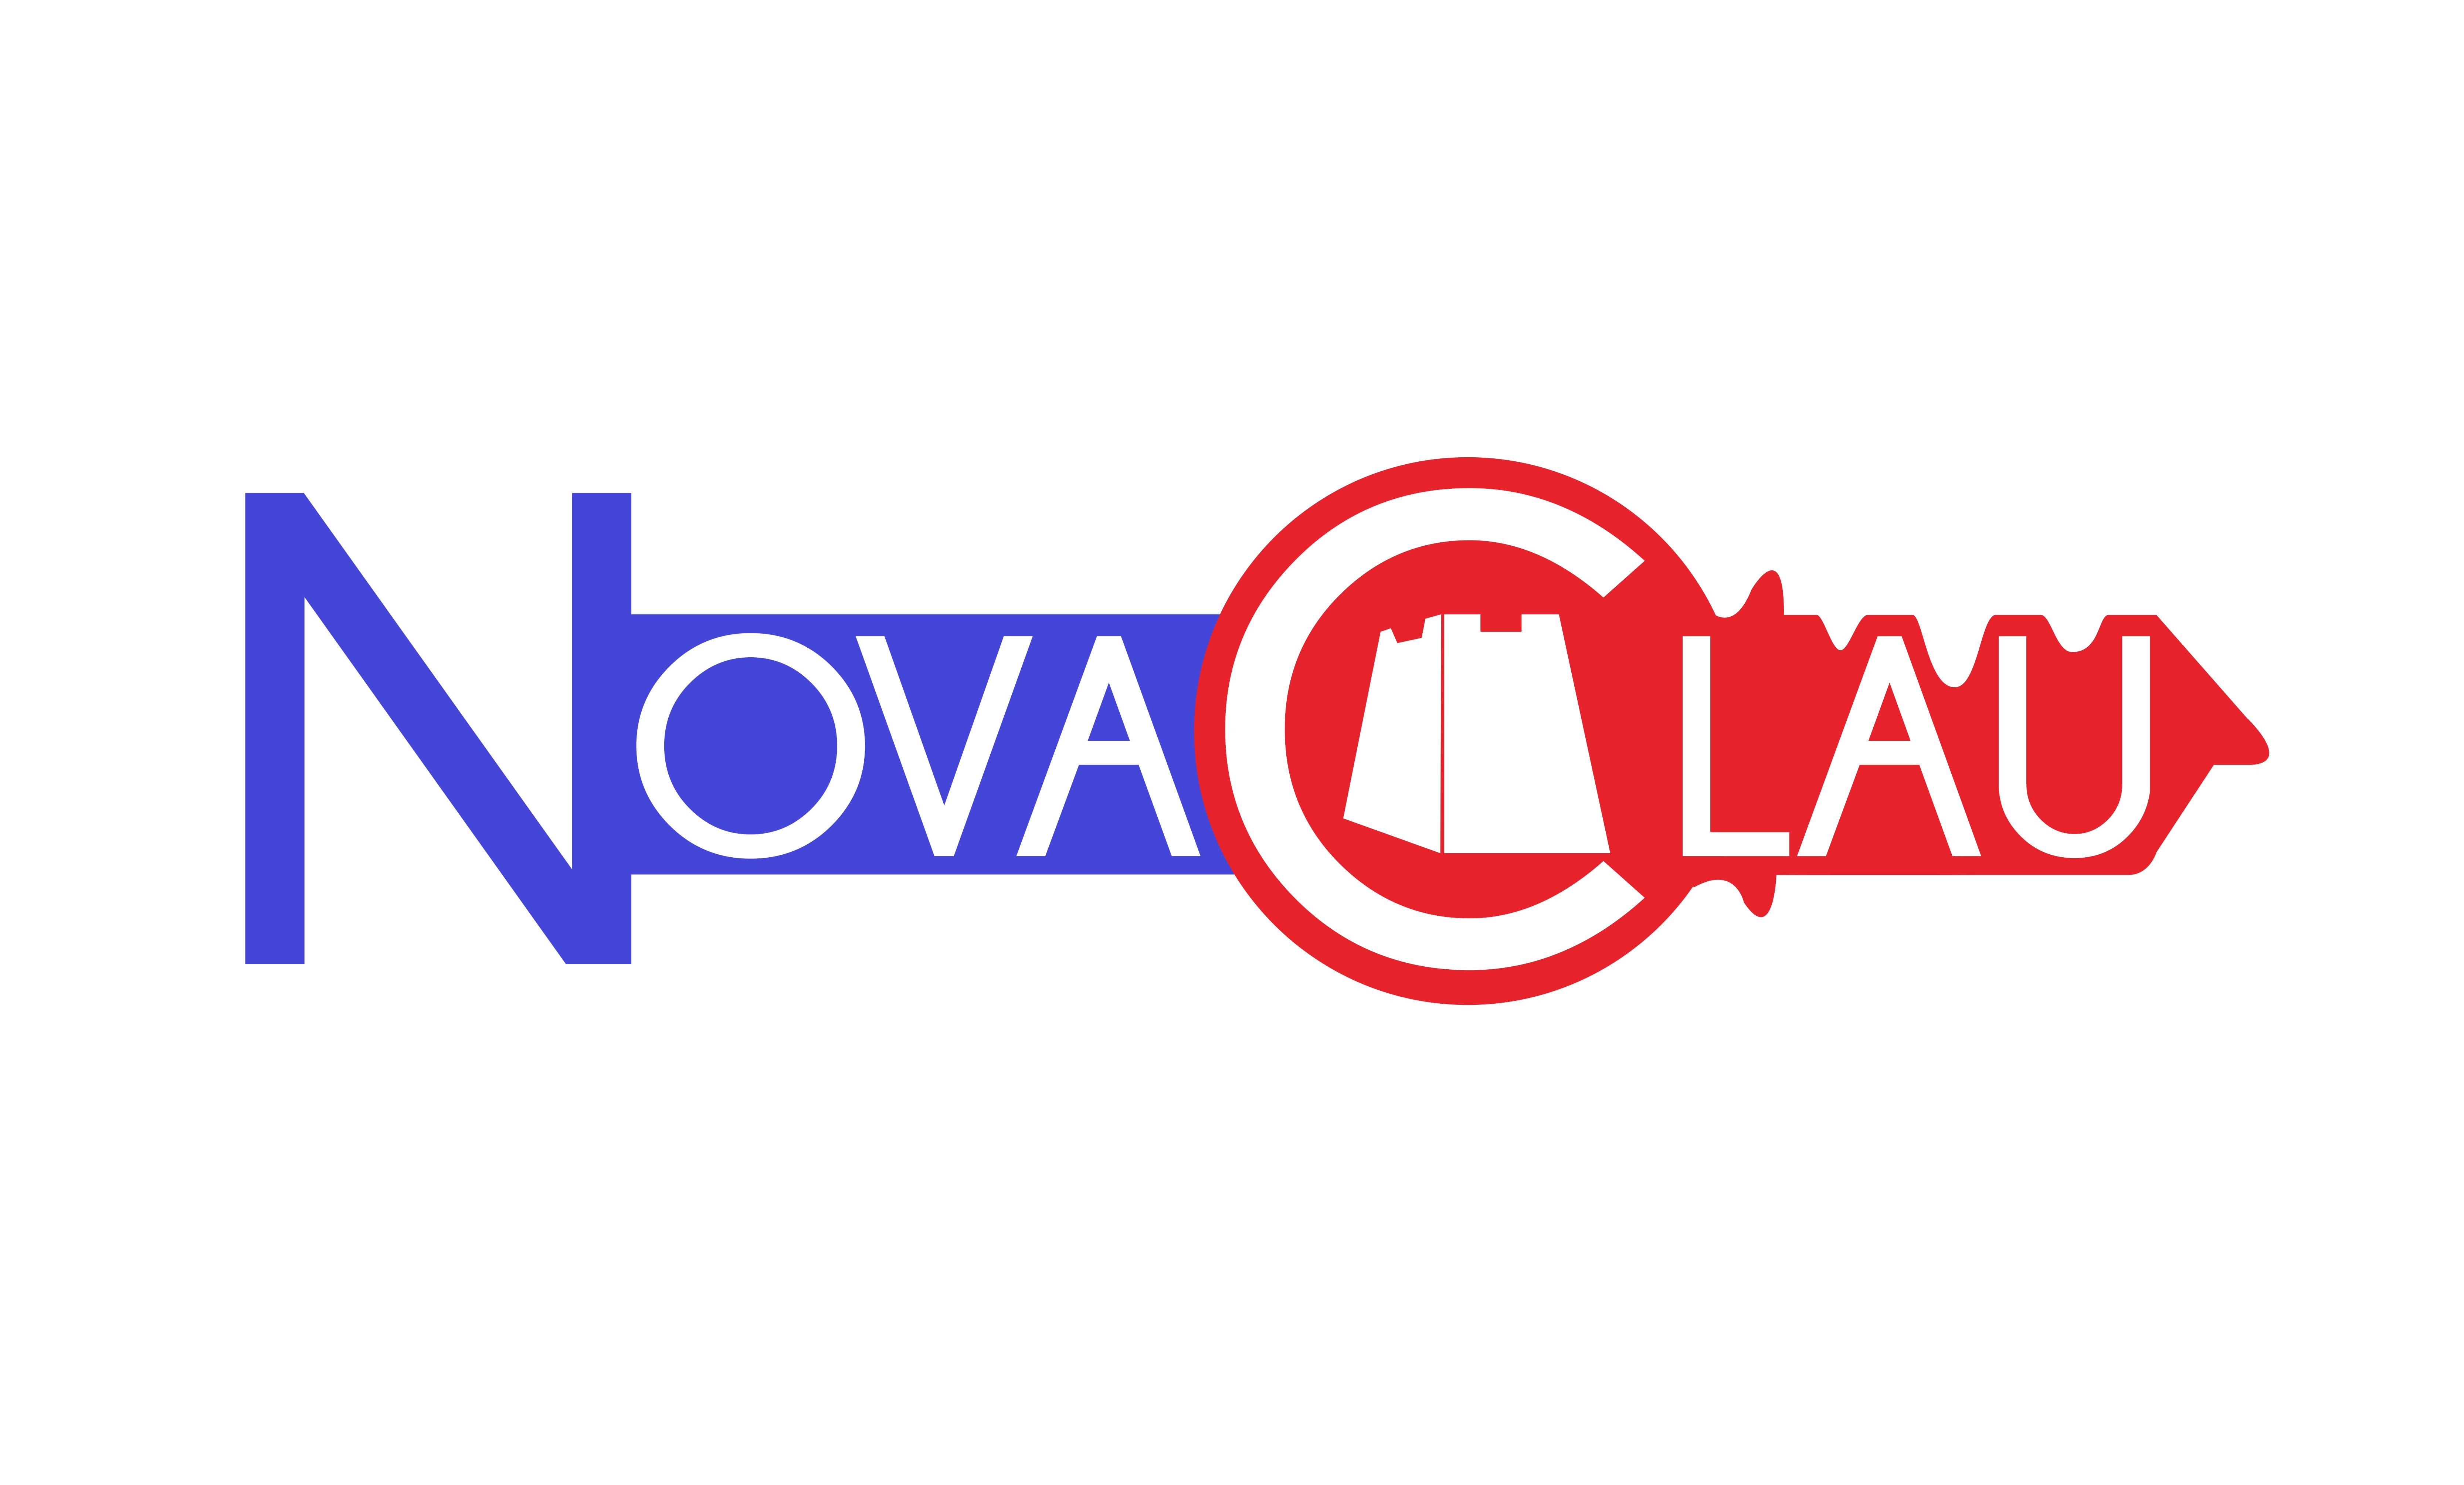 Ferreteria Novaclau